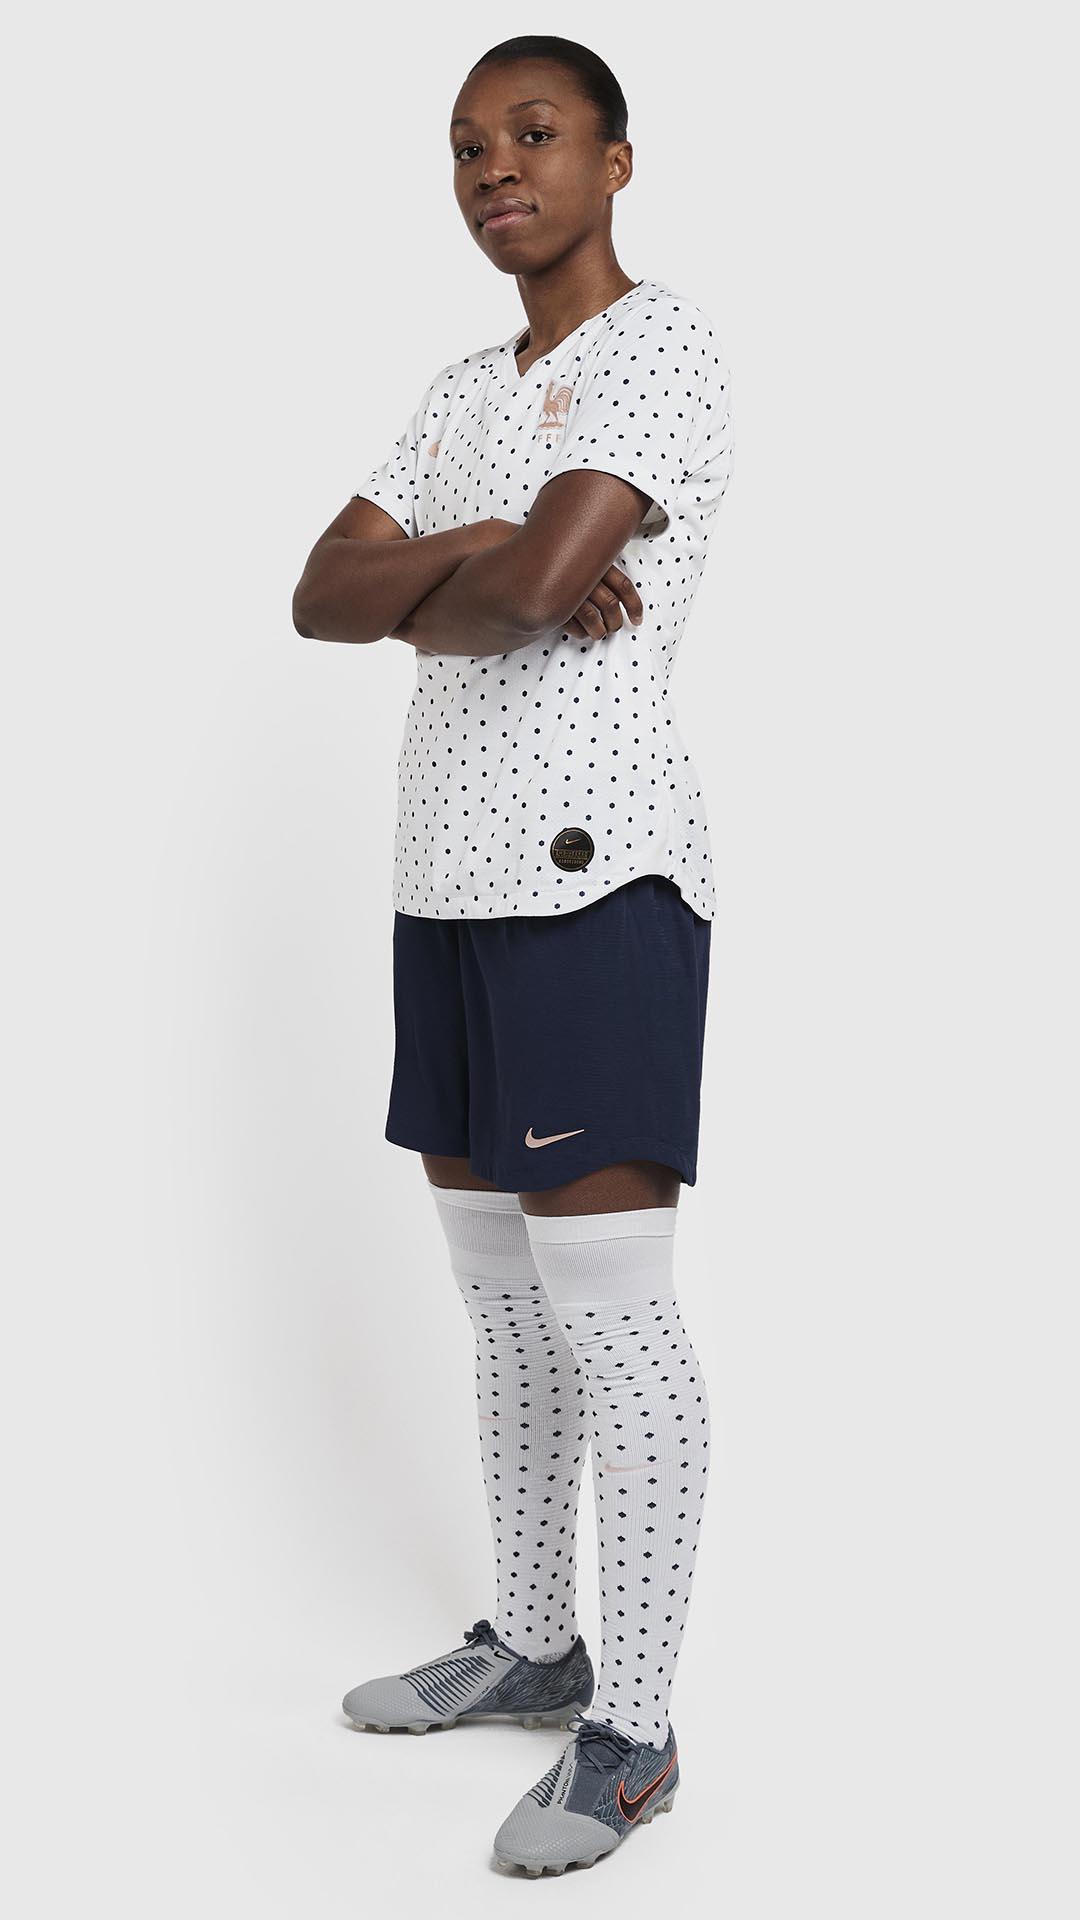 the latest eedc9 cb605 France 2019 Women's World Cup Nike Kits - FOOTBALL FASHION.ORG